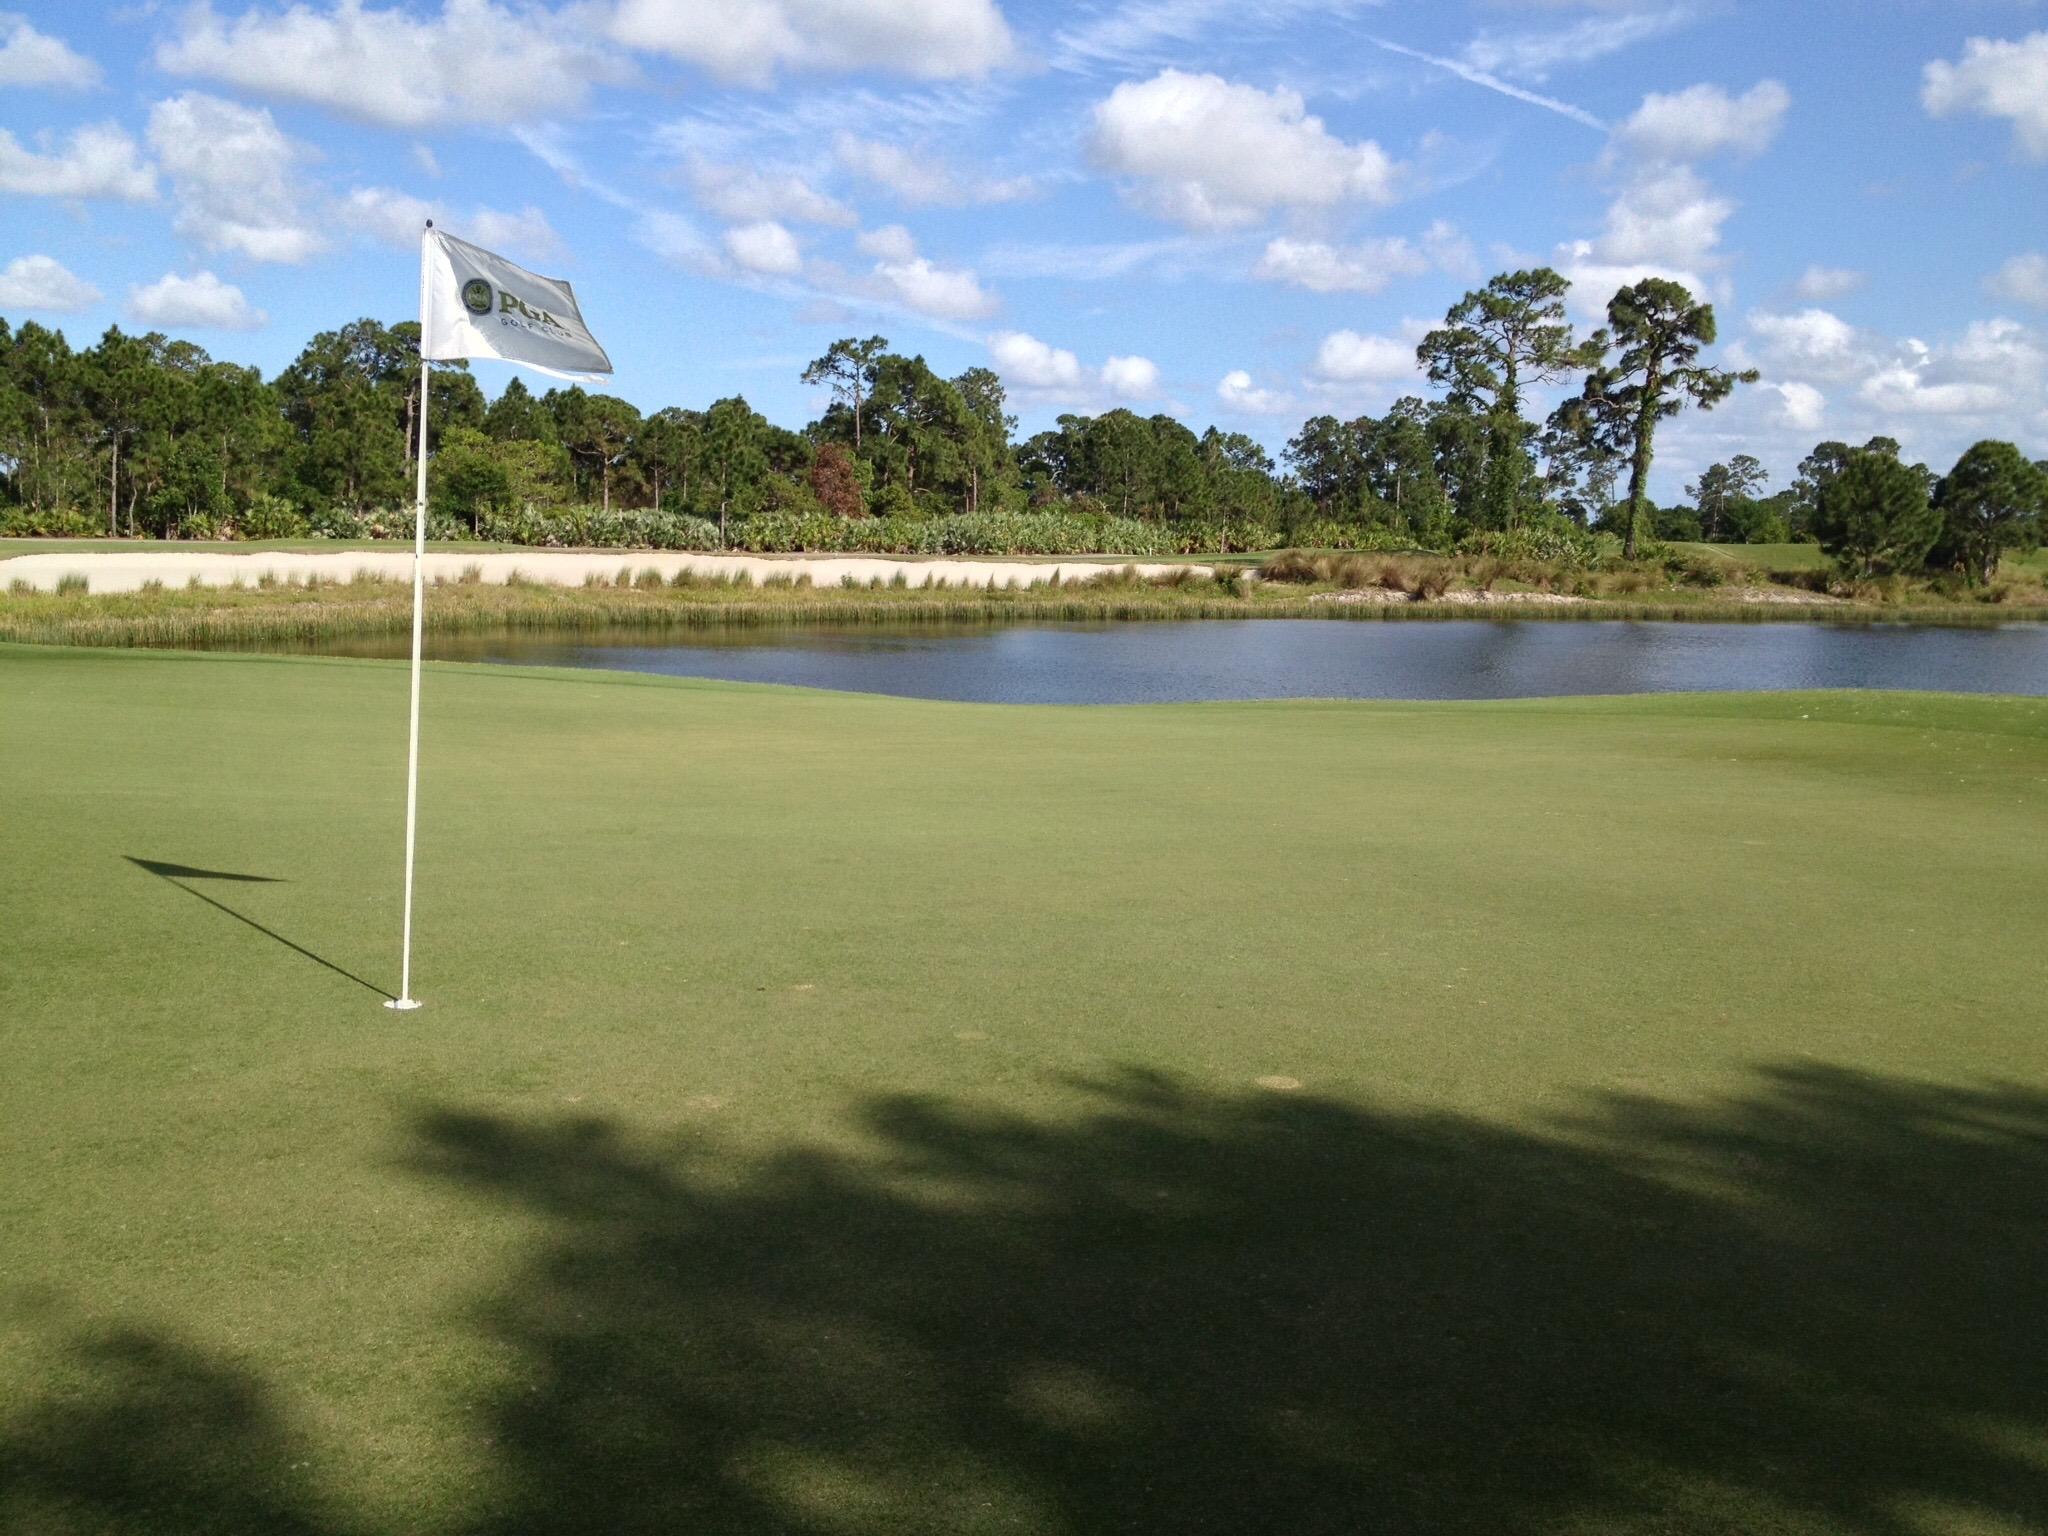 Golf Match Play-Think A Different Way